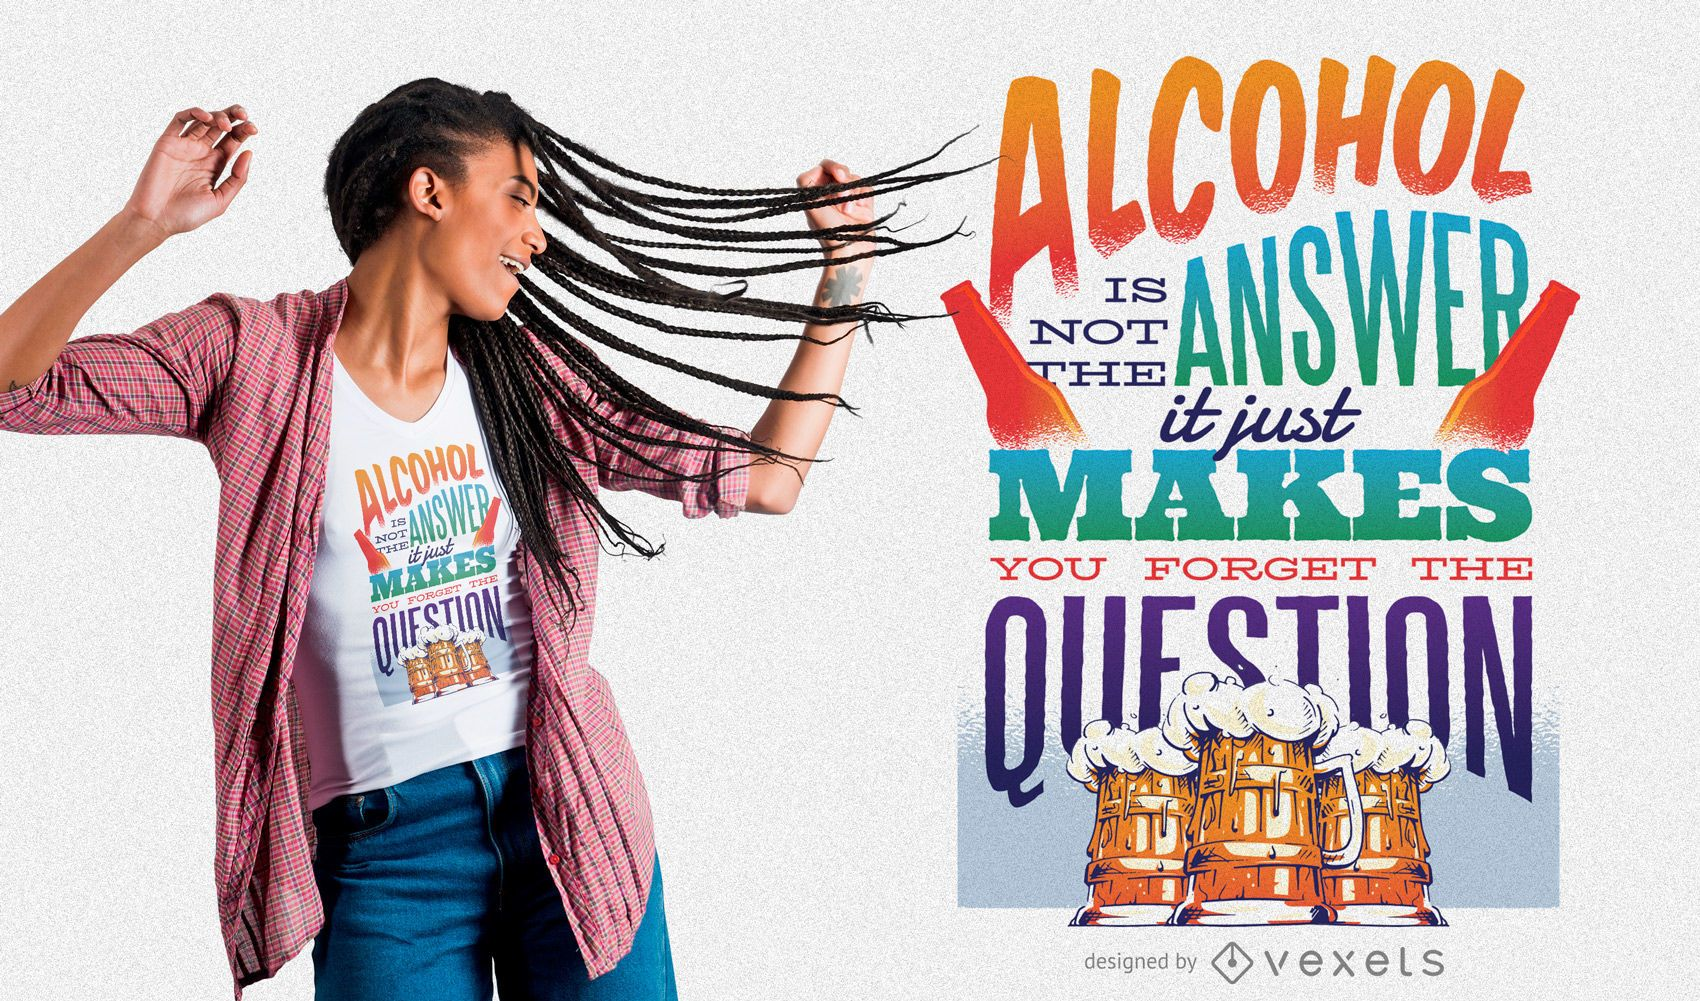 Diseño de camiseta divertida de alcohol